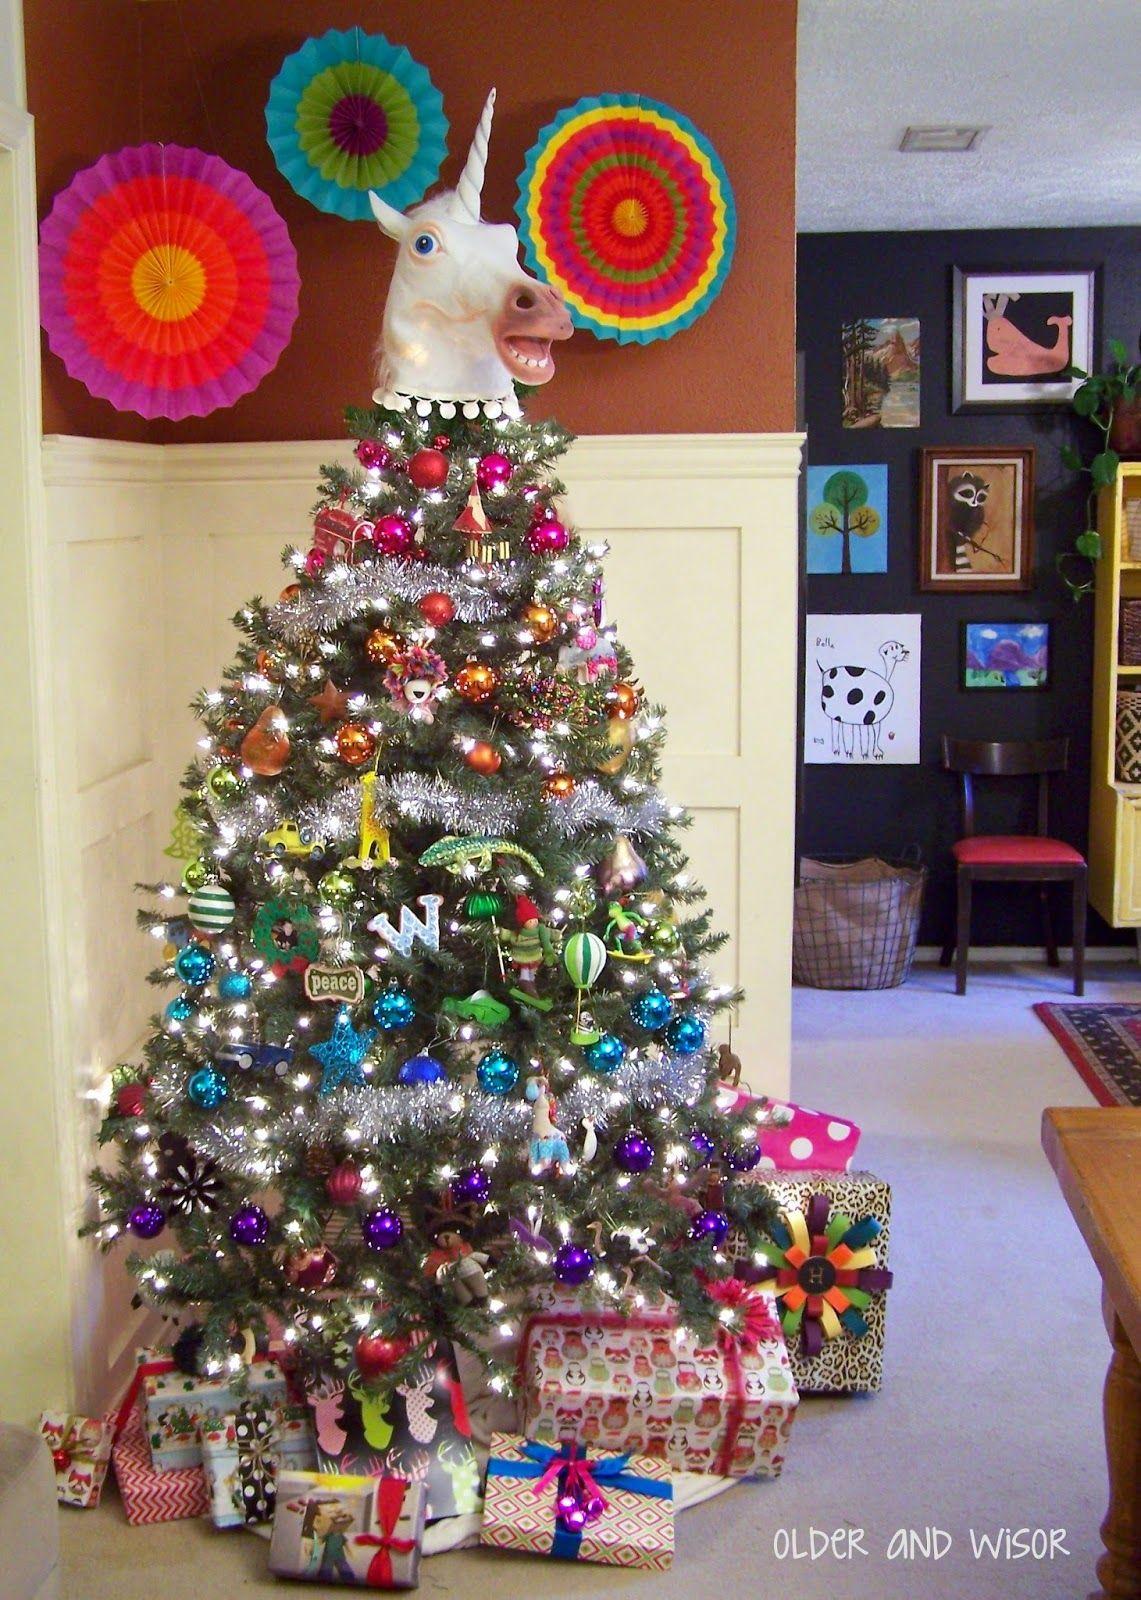 Older And Wisor Funny Christmas Tree Rainbows Christmas Colorful Christmas Tree